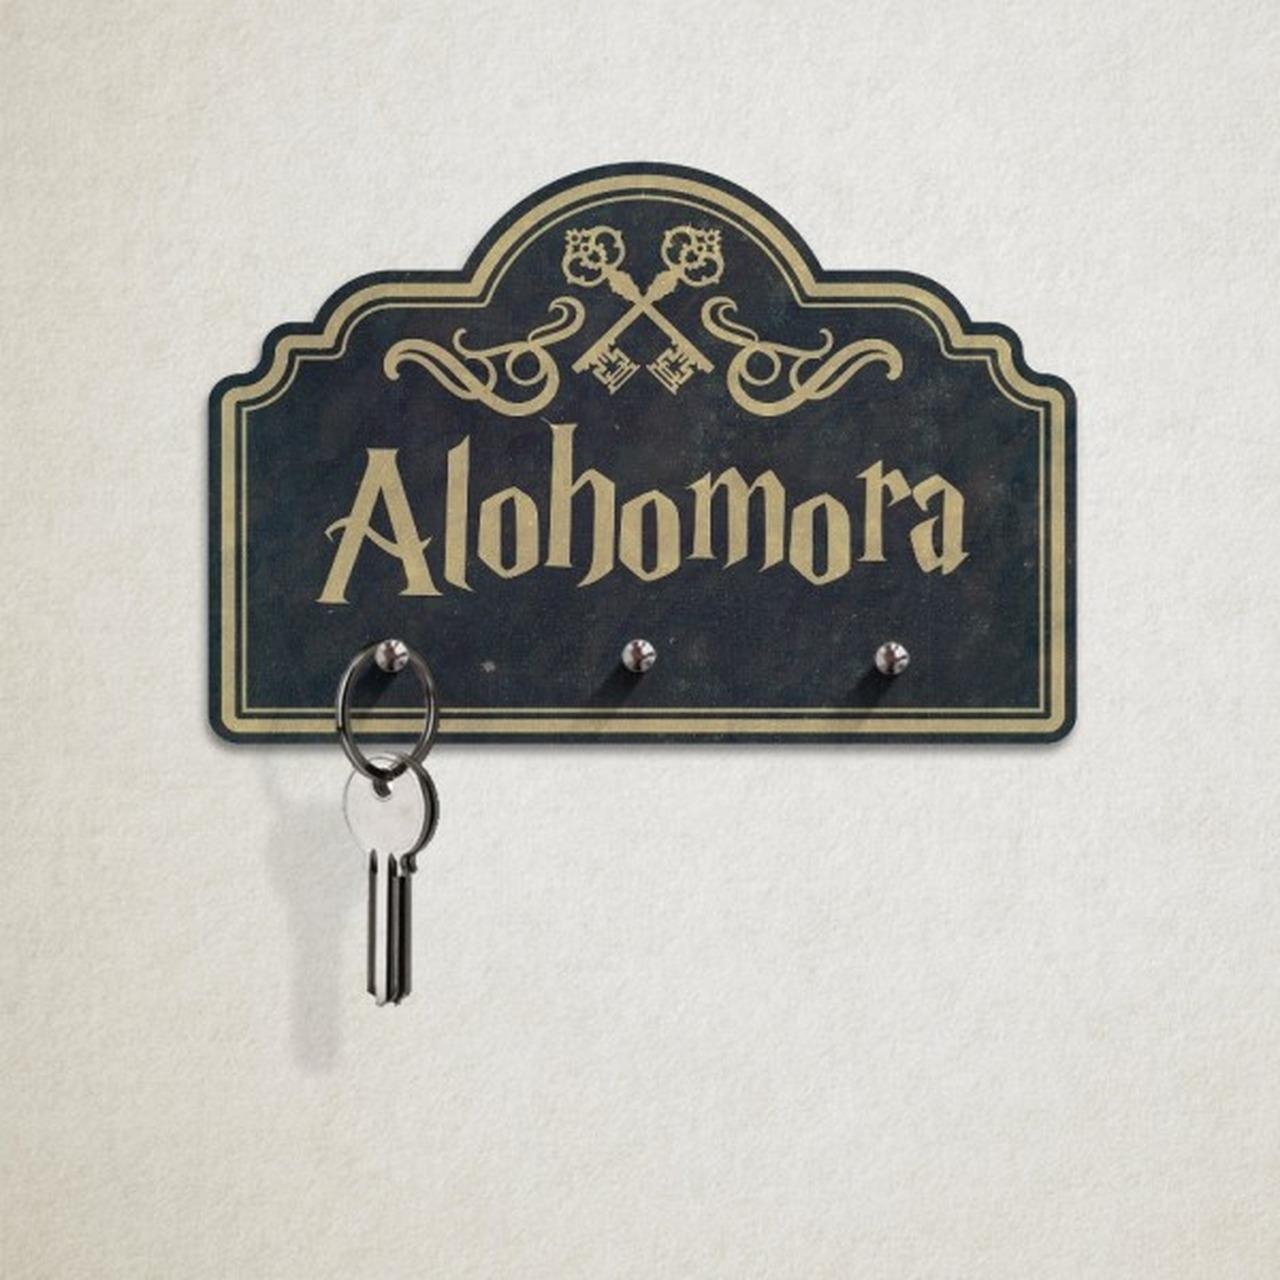 Porta Chave Alohomora (Bruxo)